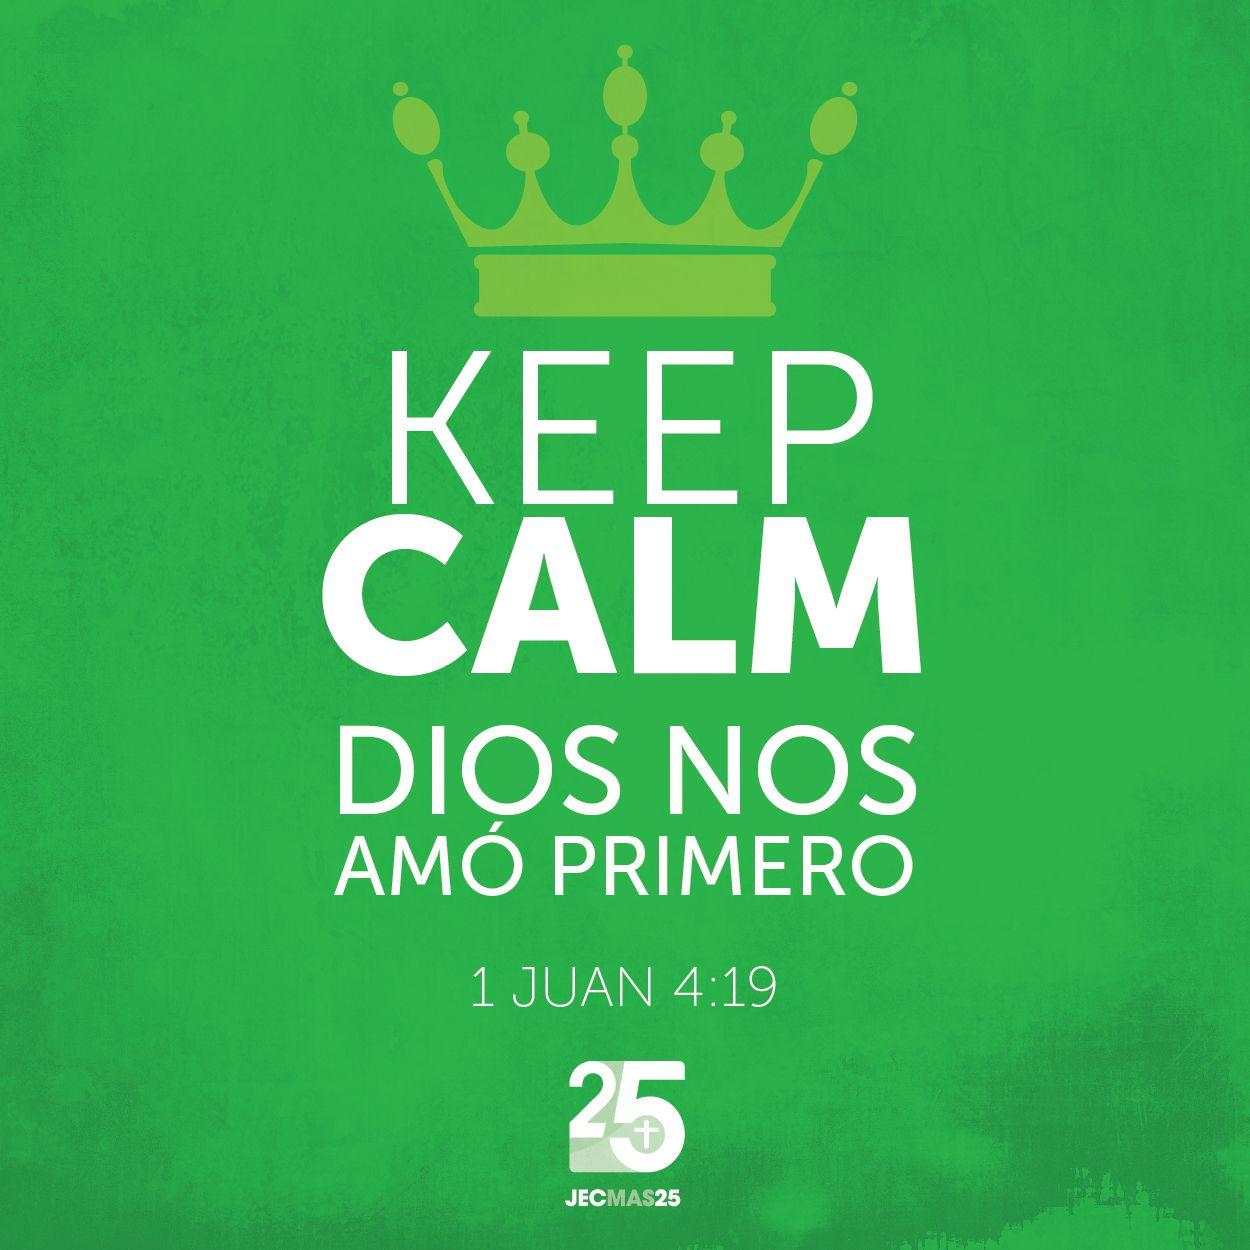 """Nosotros le amamos a él, porque él nos amó primero"" - 1 Juan 4:19"